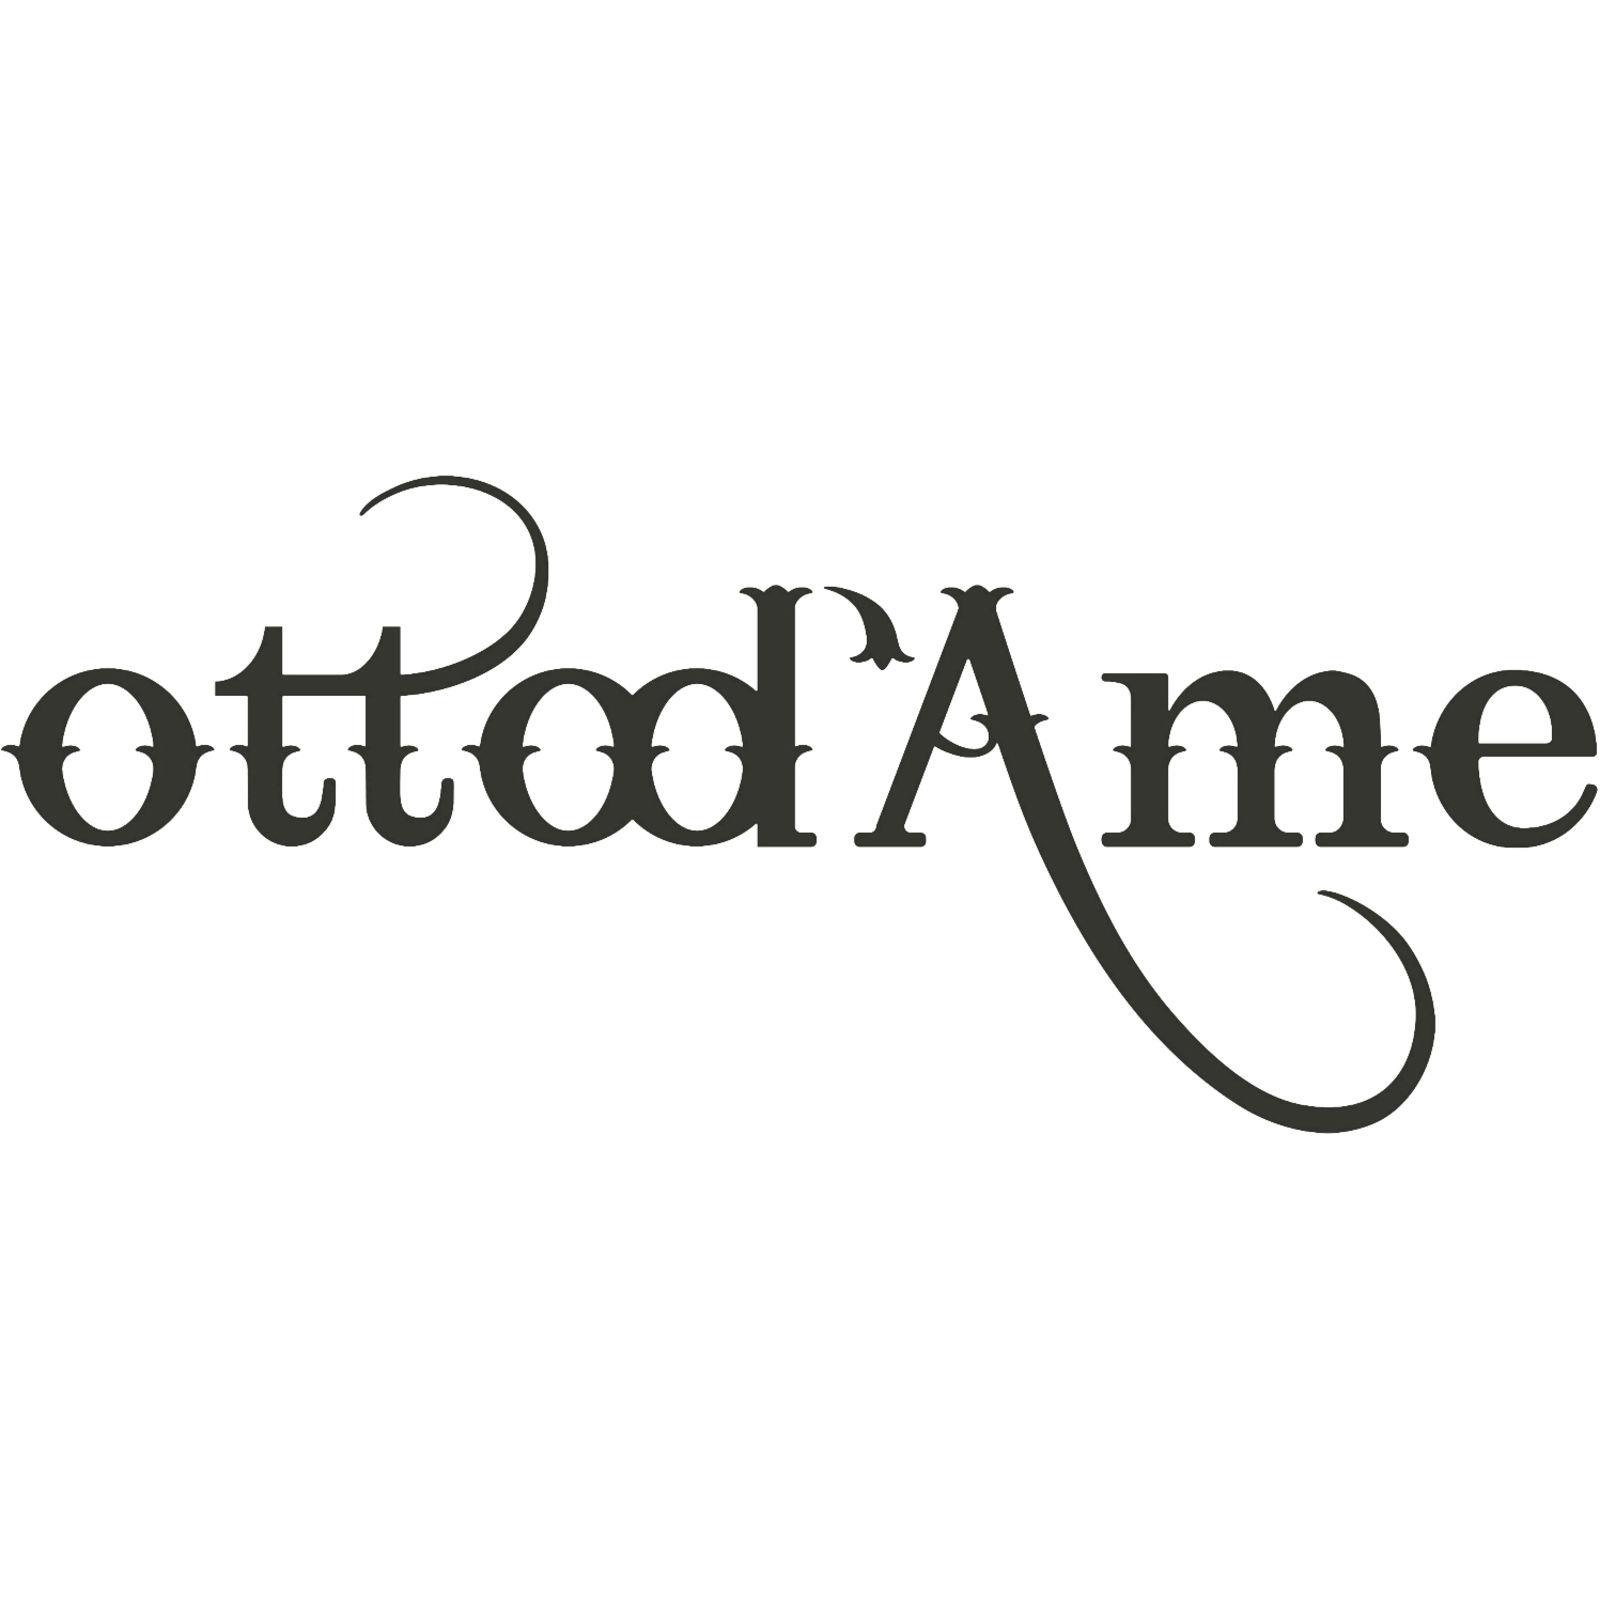 ottod' Ame (Image 1)